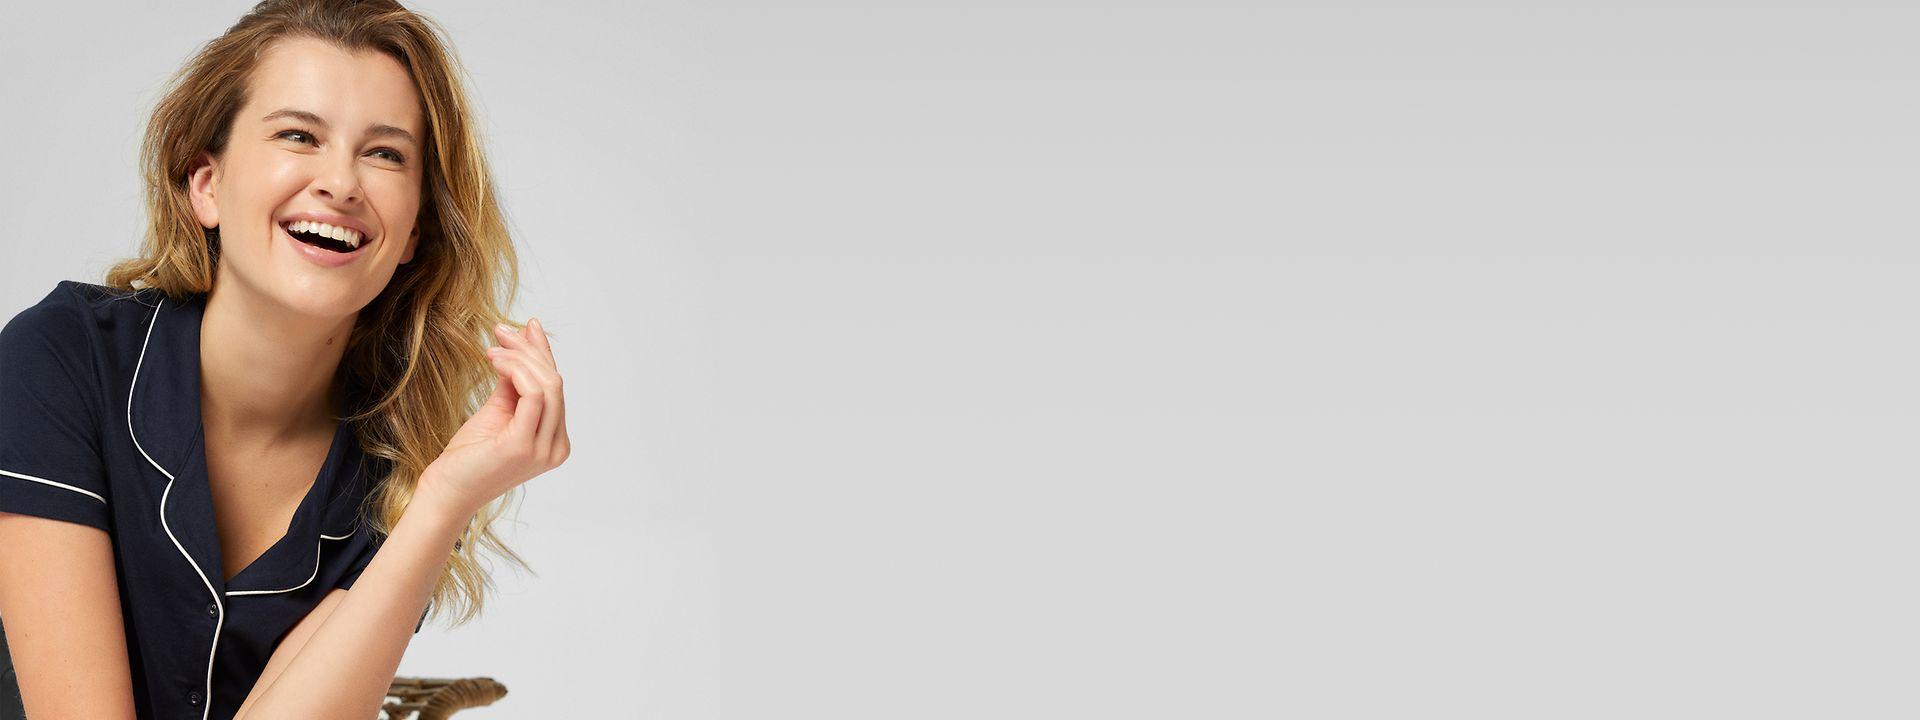 412021- women - startpage- hero medium - live shopping - IMG